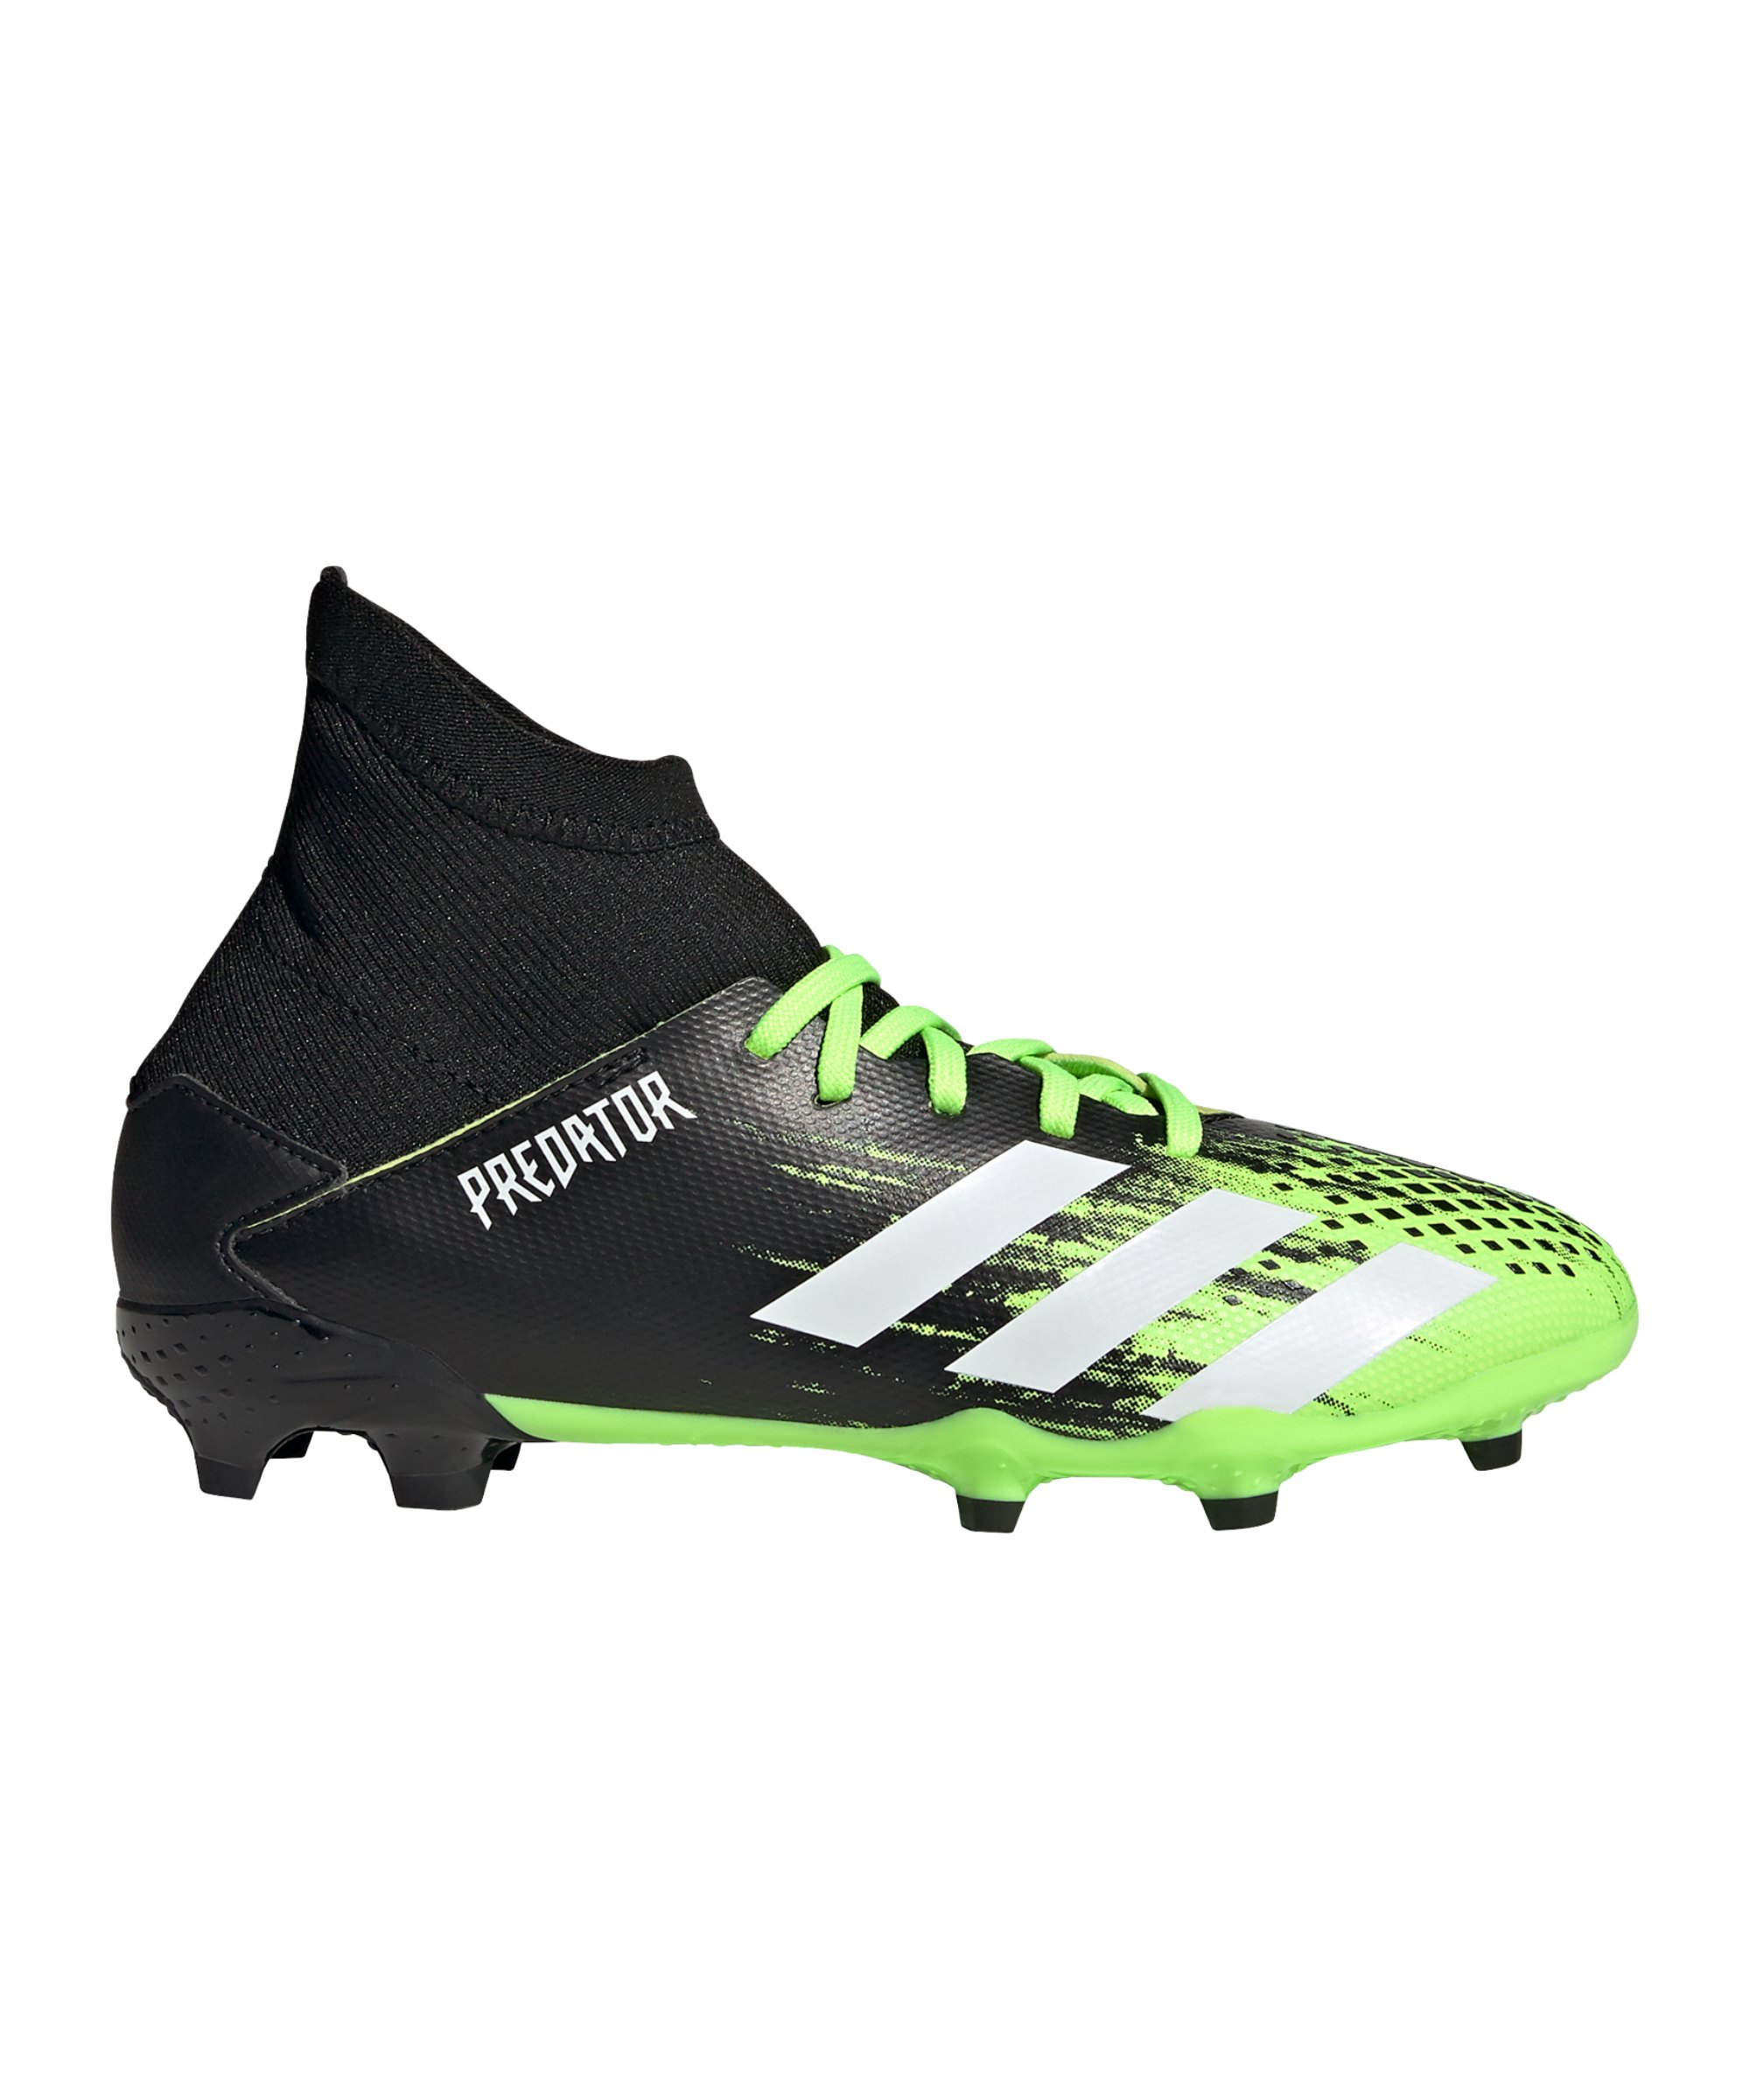 adidas Predator Precision to Blur 20.3 FG J Kids Grün Weiss - gruen